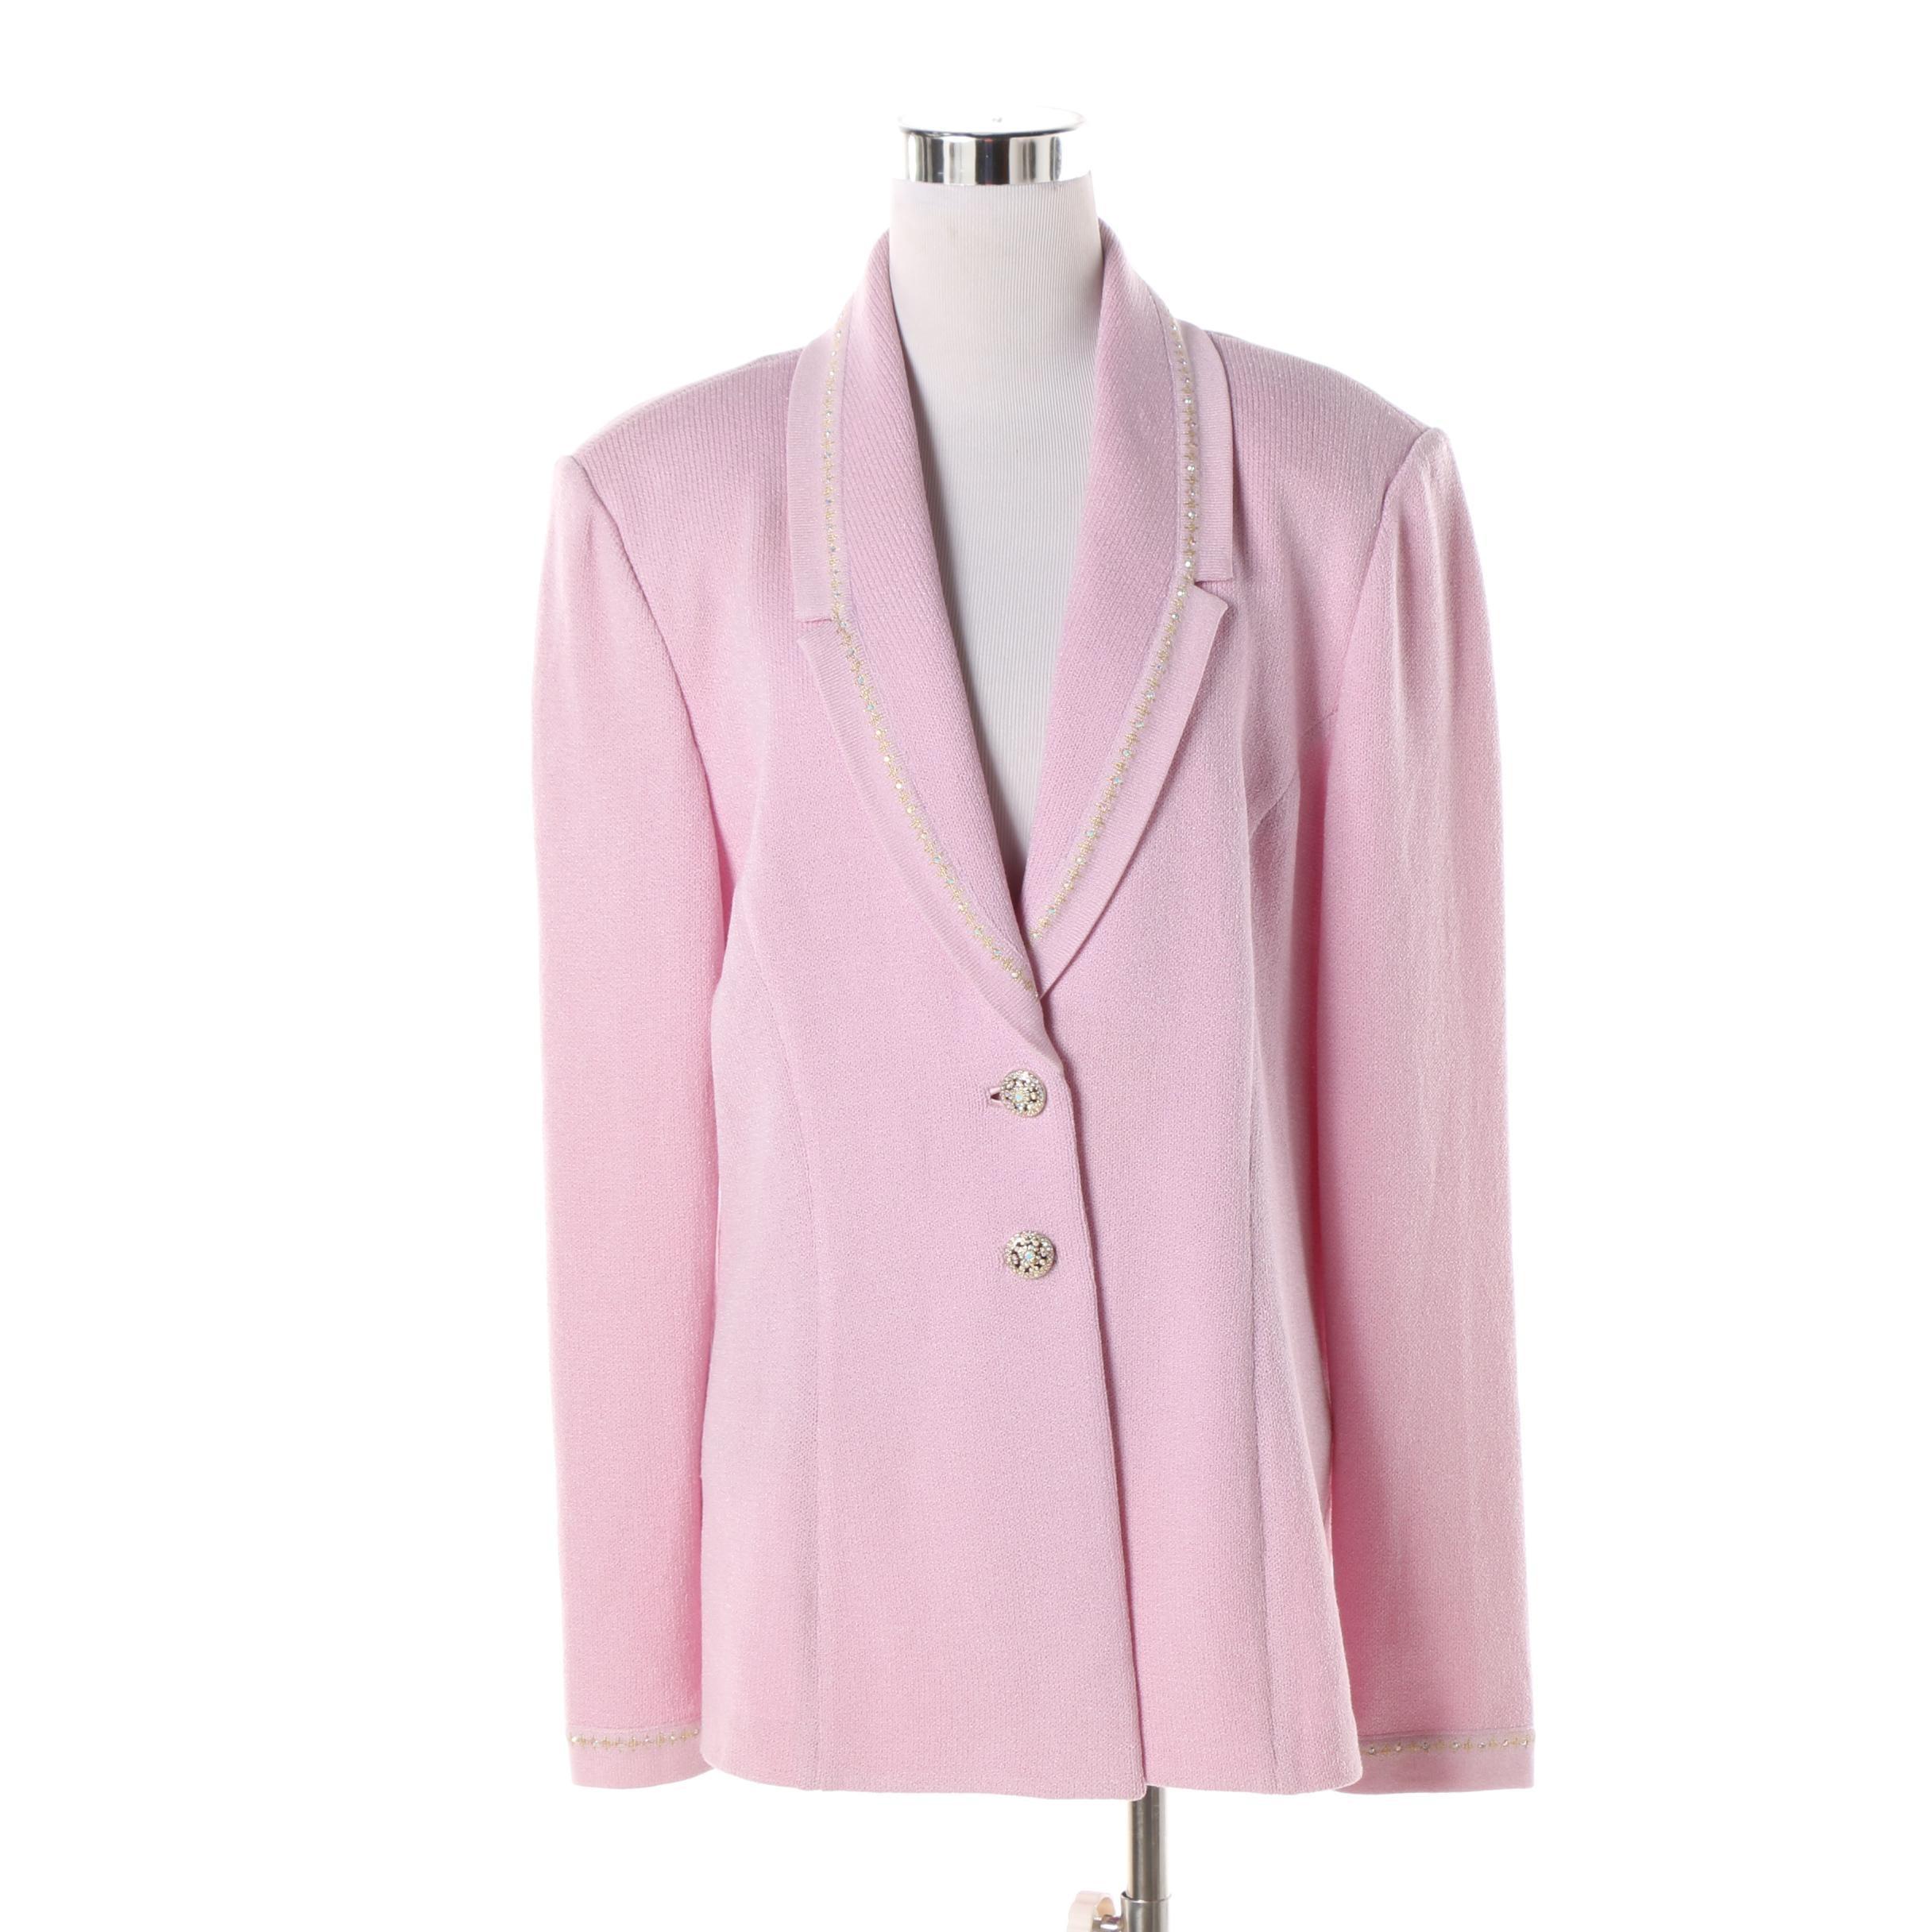 Women's St. John Evening Pink Knit Jacket